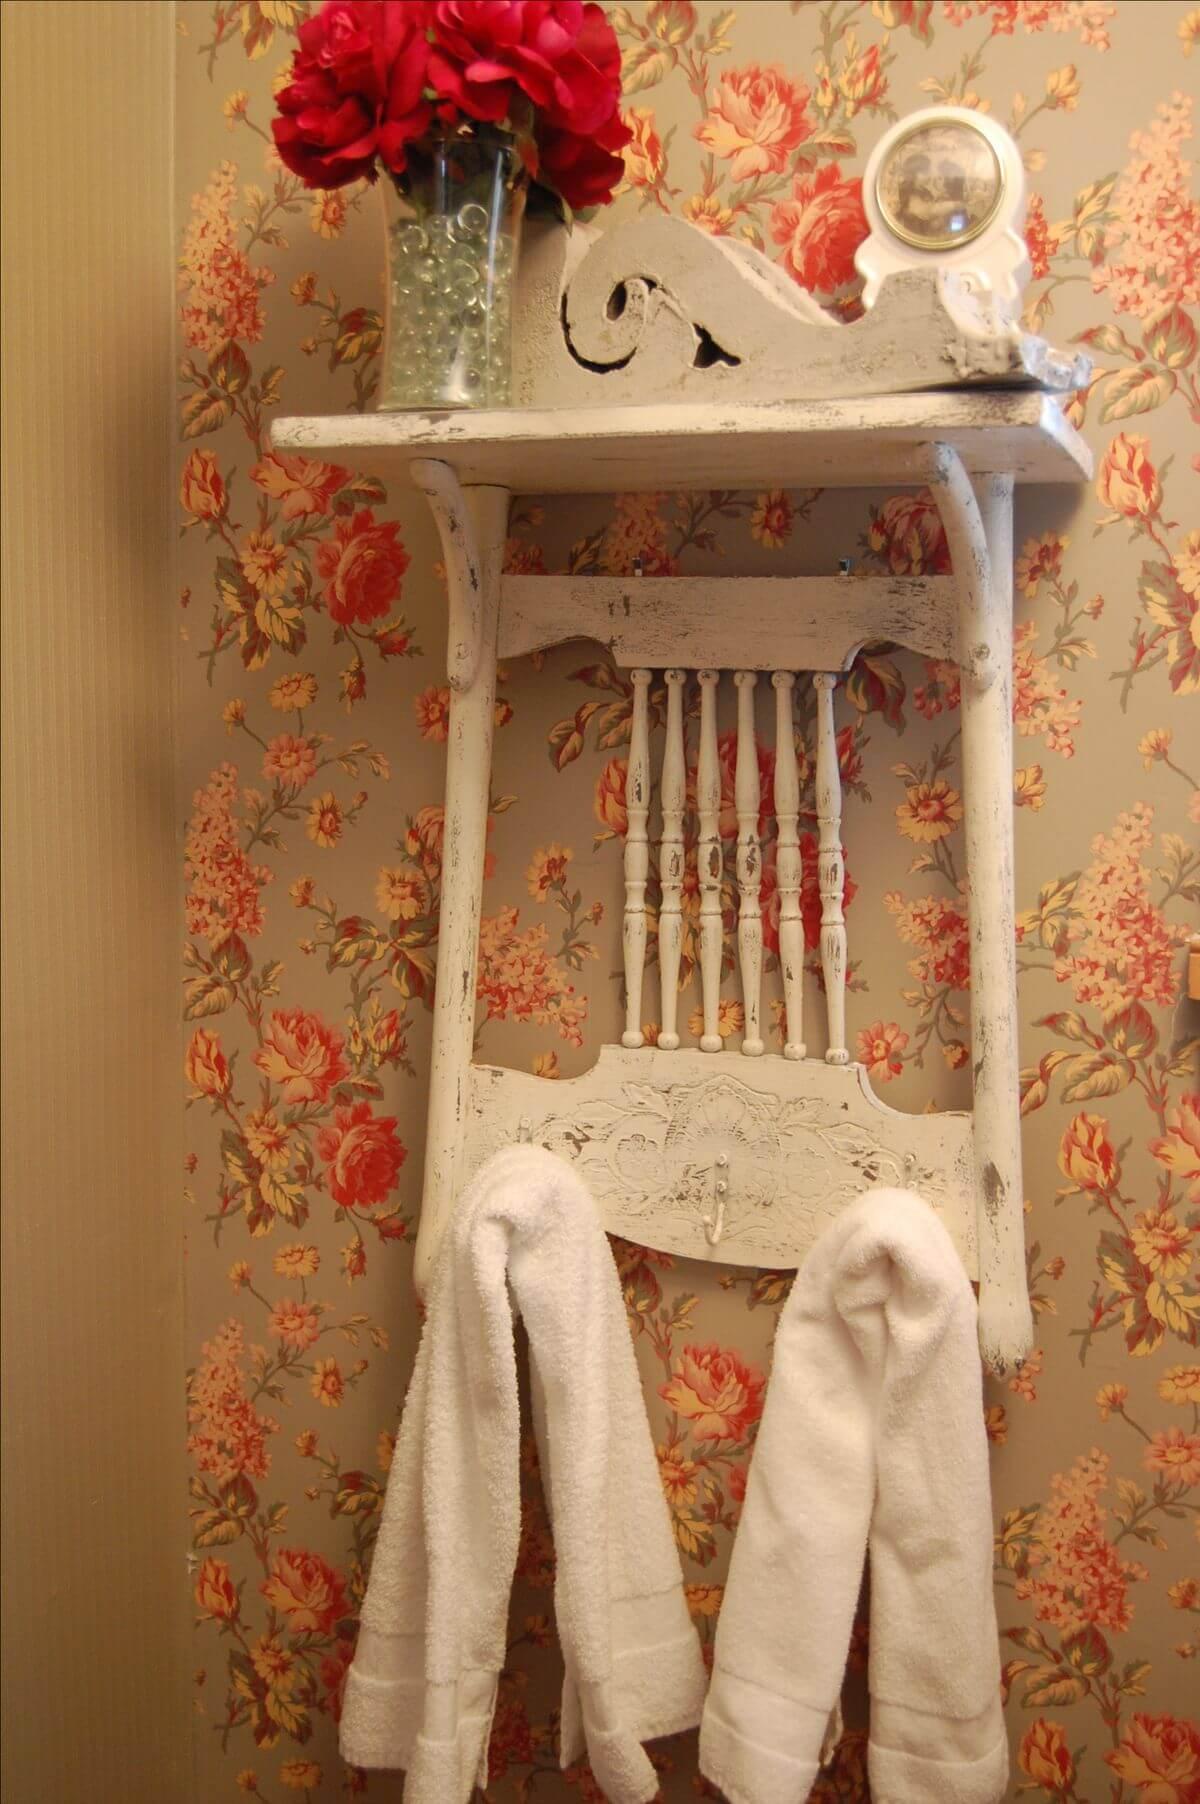 Charming Chair-Mounted Towel Hang